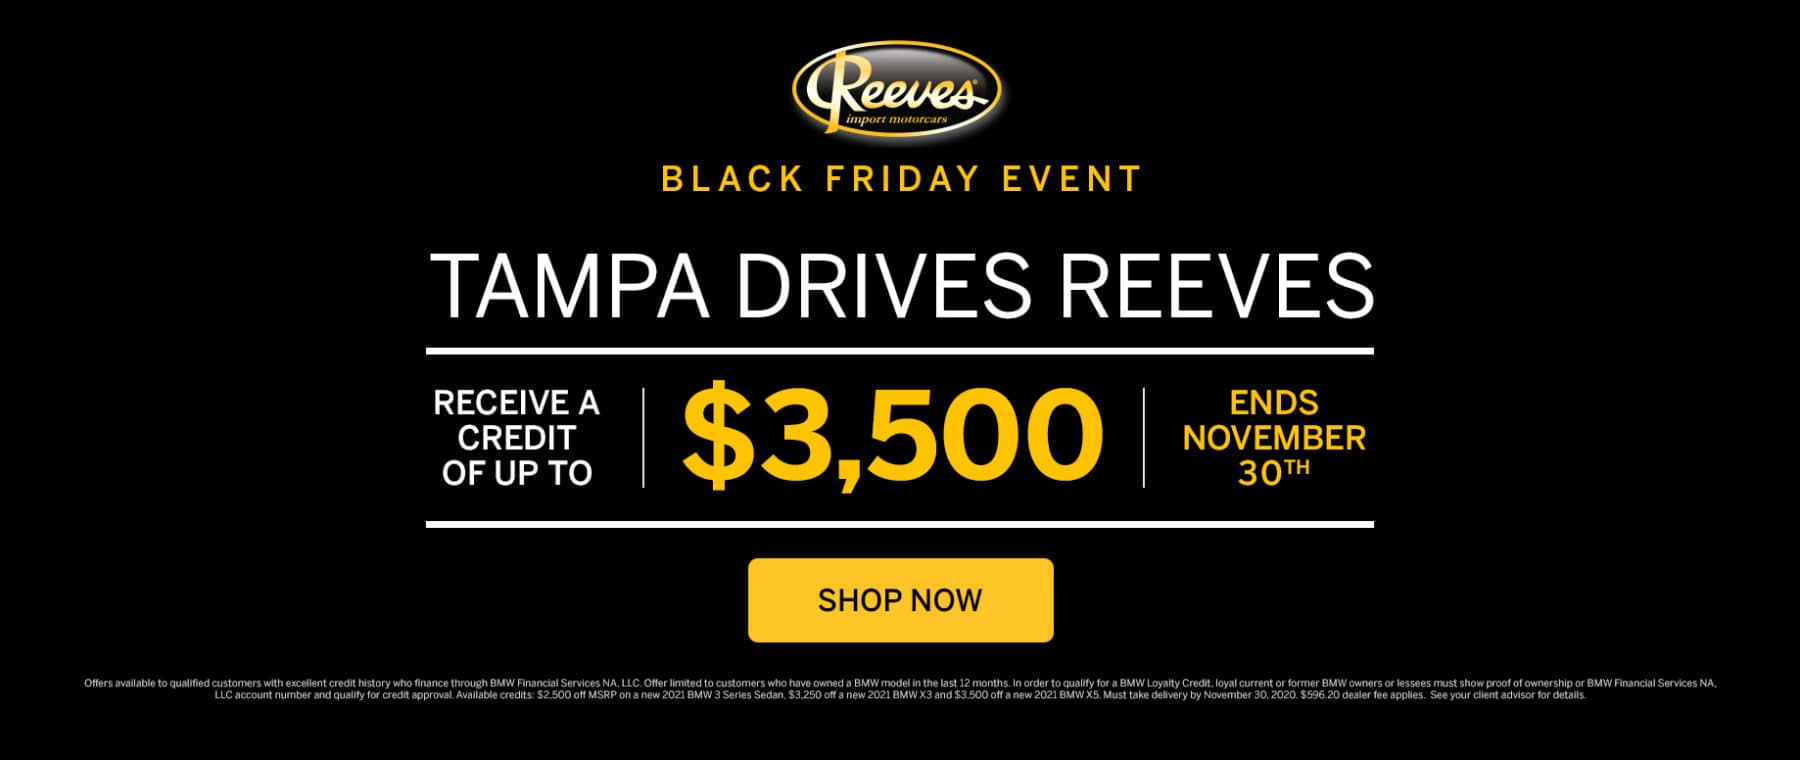 Reeves-BlackFriday-Nov-Webslide-R1